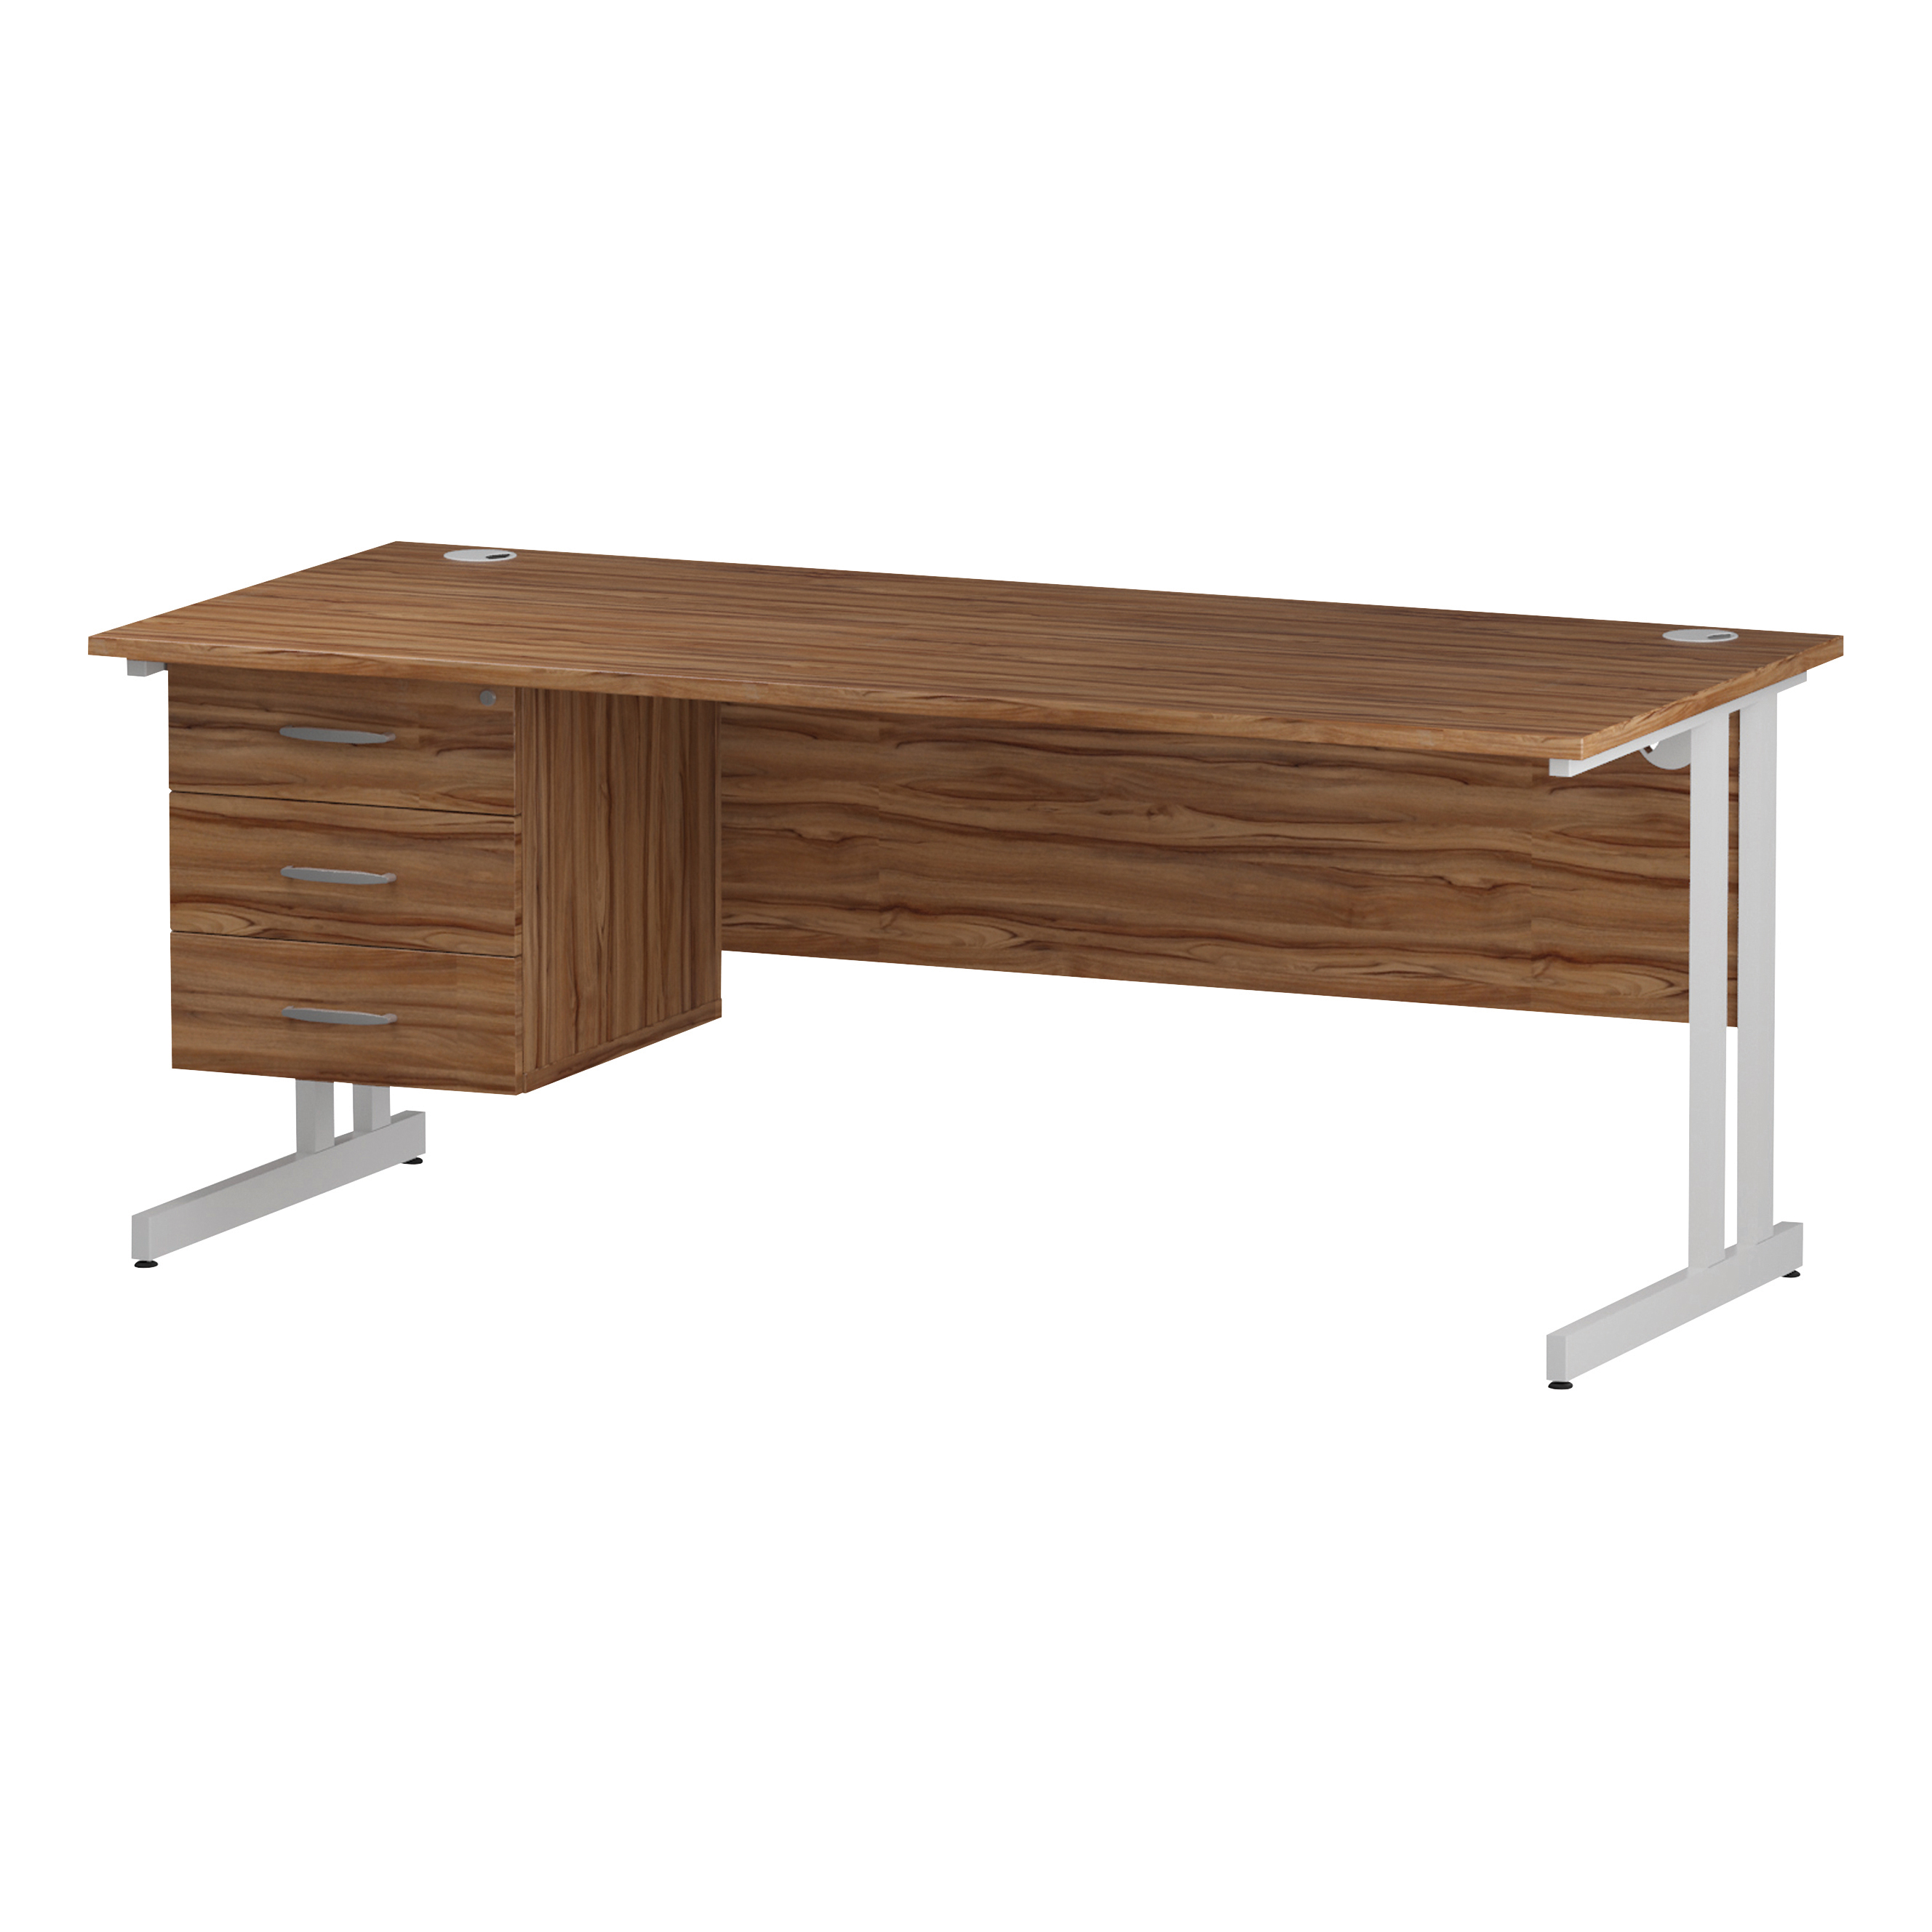 Trexus Rectangular Desk White Cantilever Leg 1800x800mm Fixed Pedestal 3 Drawers Walnut Ref I001934